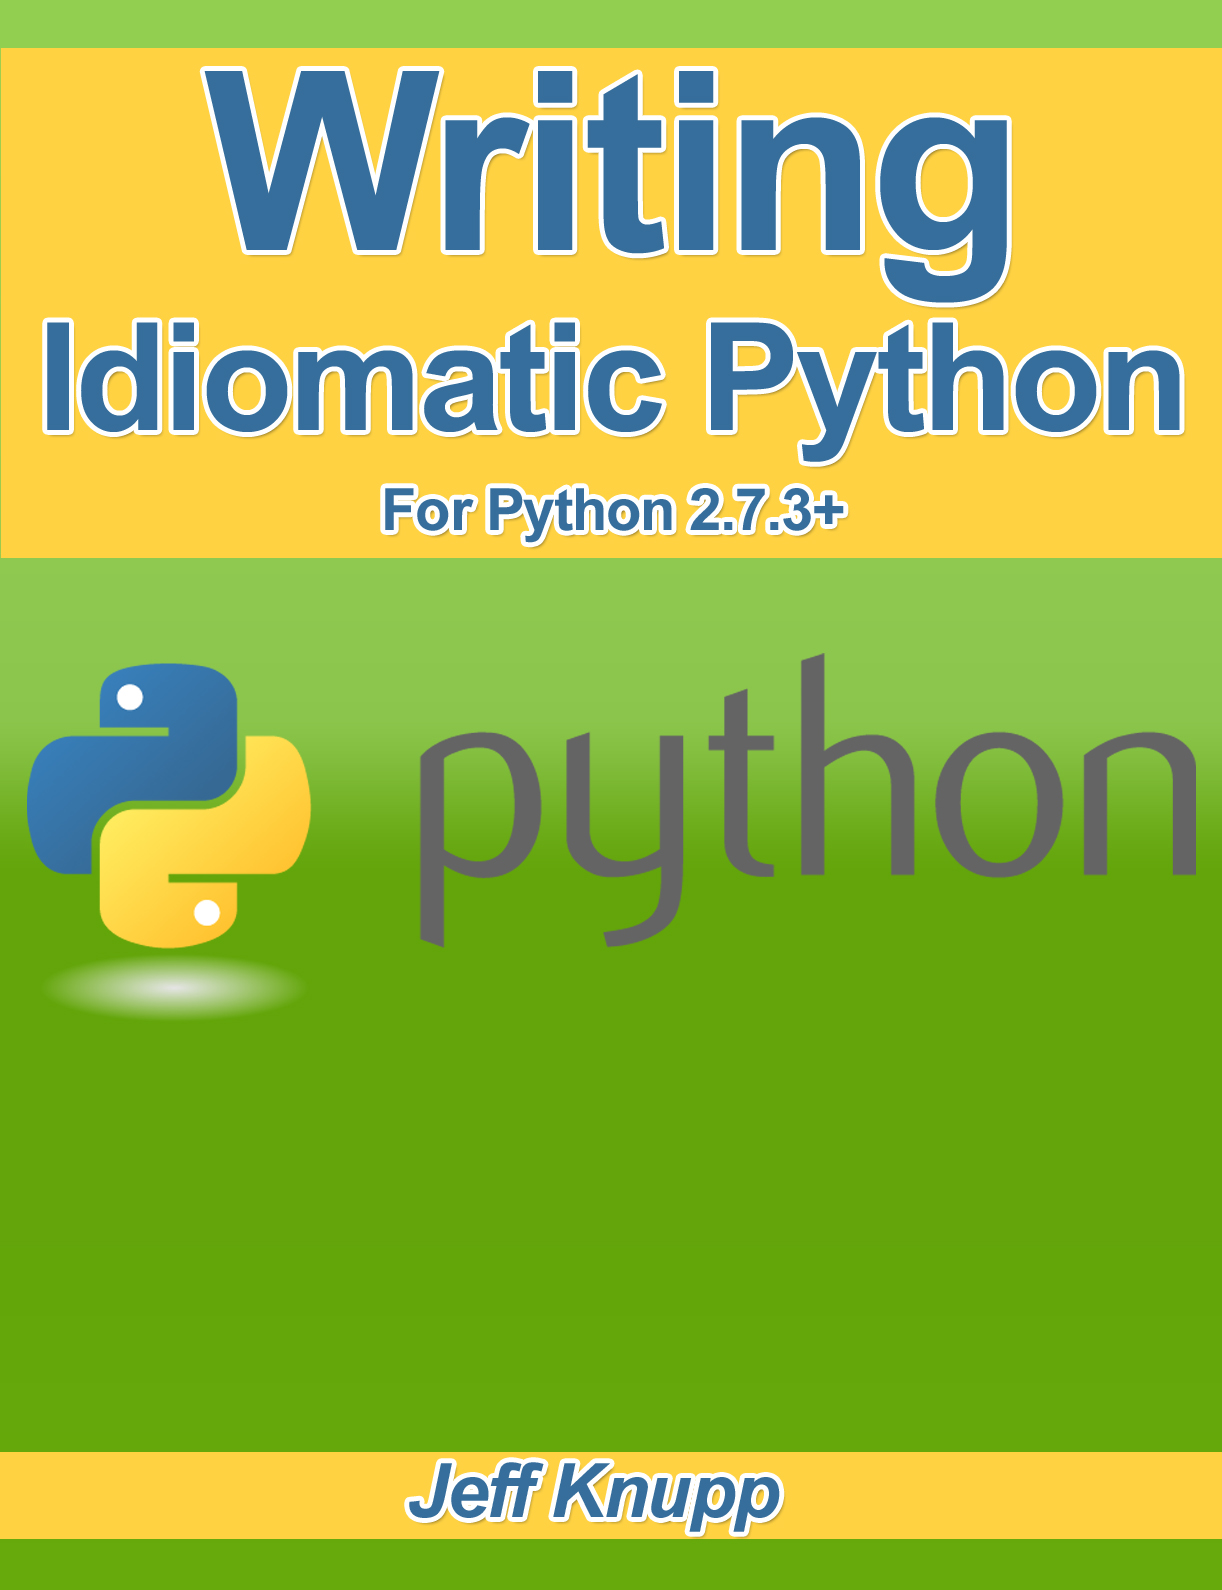 Writing Idiomatic Python 2 7+ PDF, an Ebook by Jeff Knupp